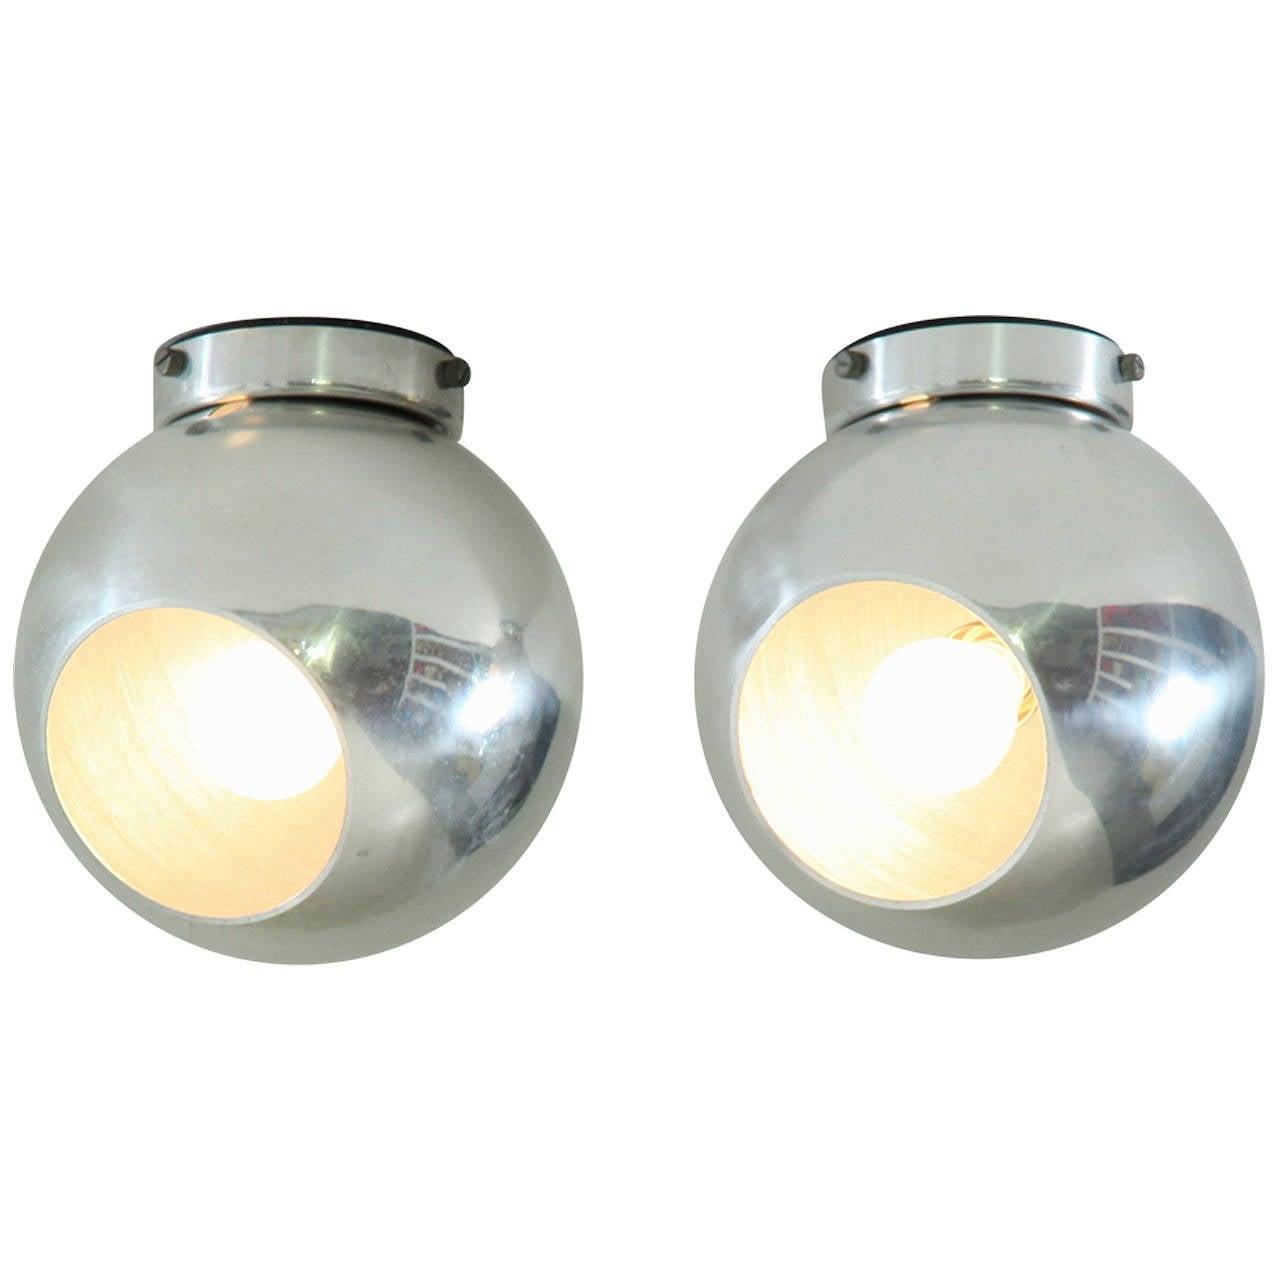 Pair Of Gino Sarfatti Flush Mounts Or Spot Lights